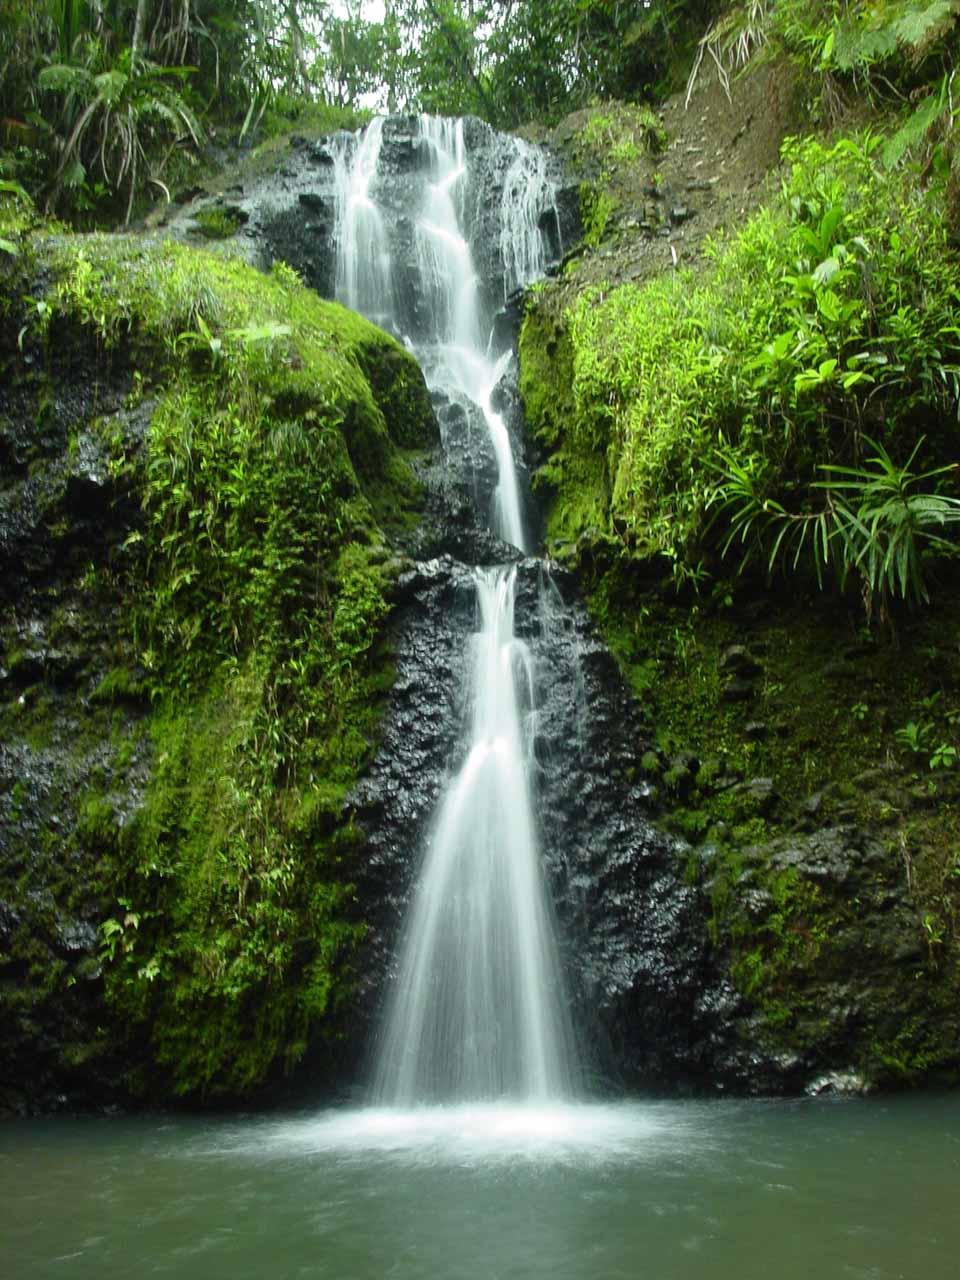 Waisila Falls in Colo-i-Suva near the capital city of Suva